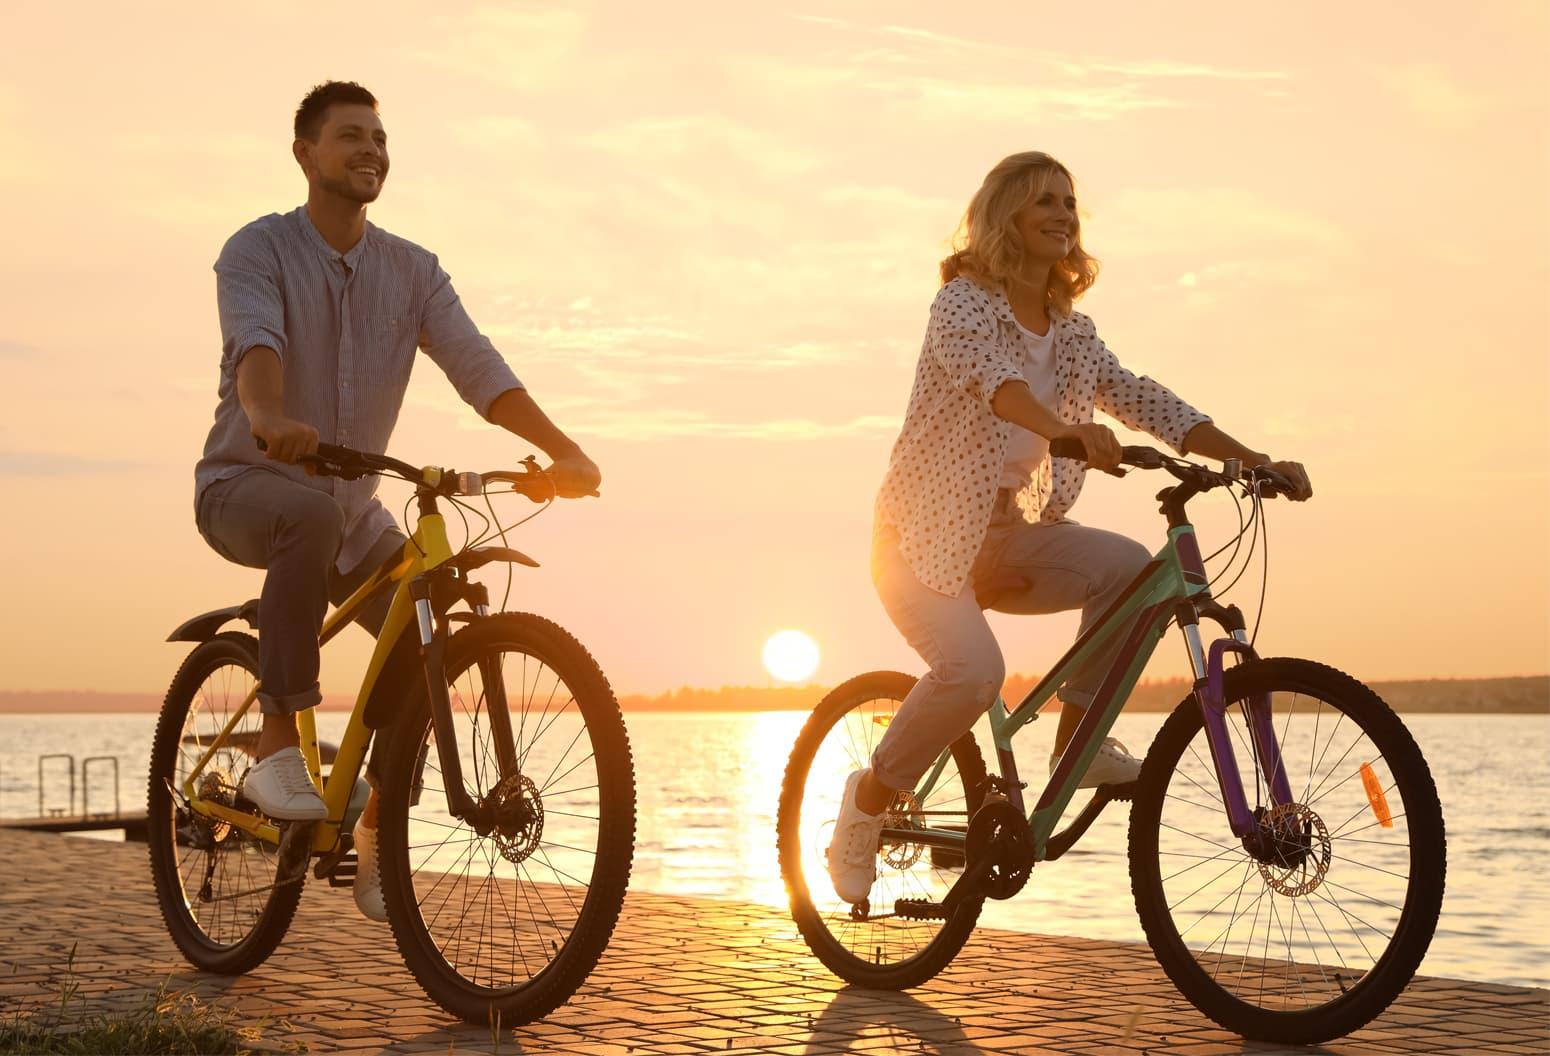 romantic couple biking at sunset